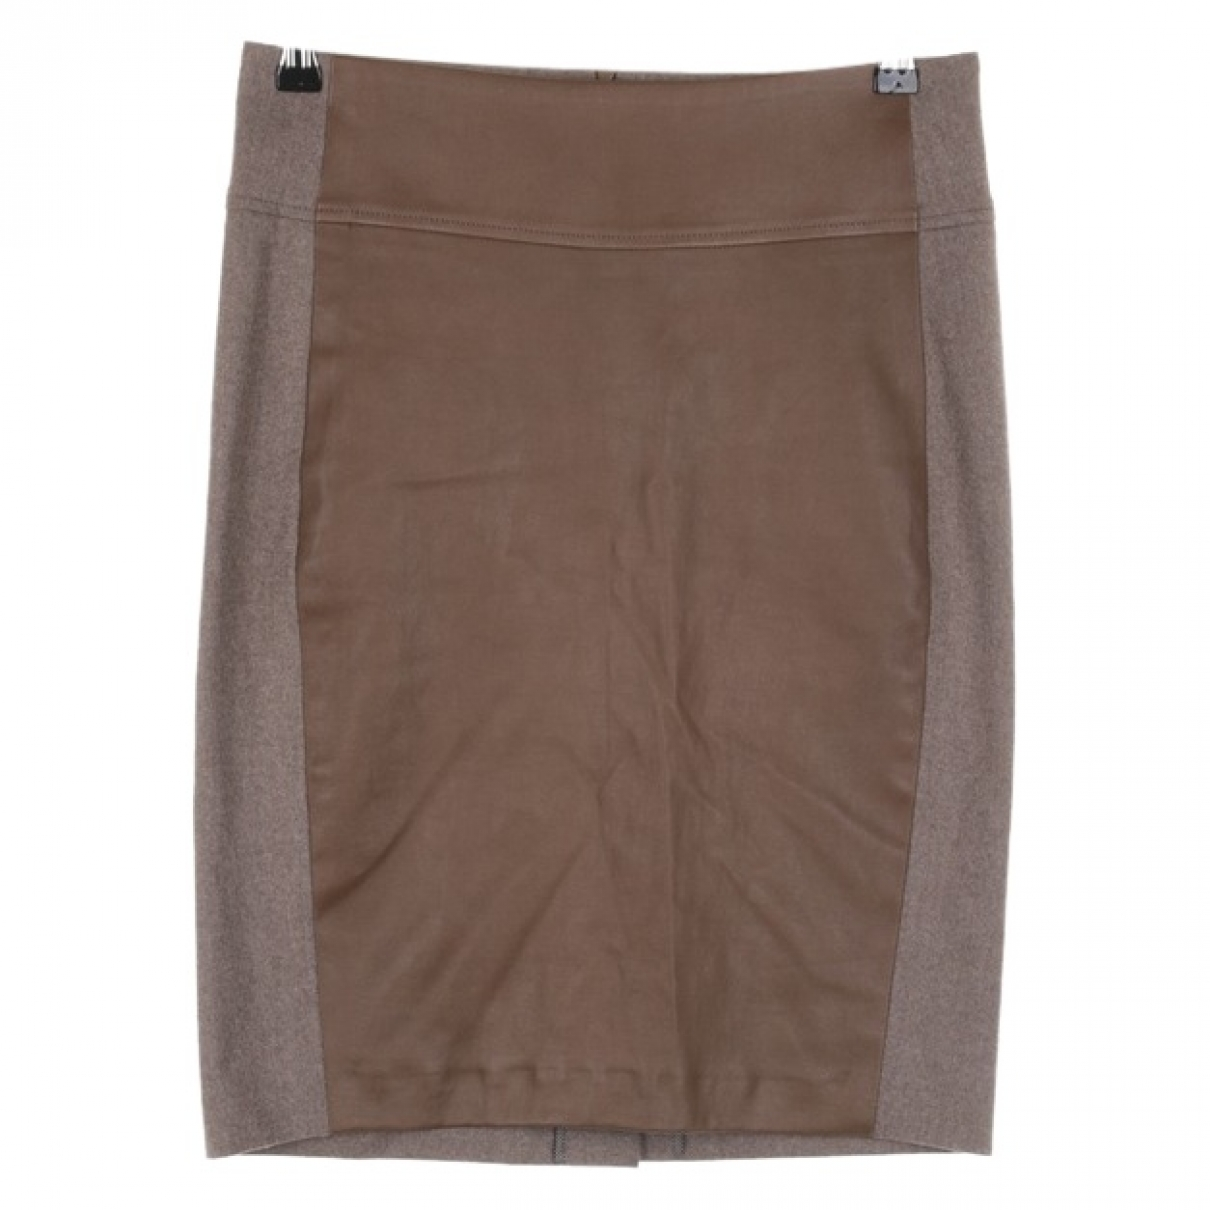 Brunello Cucinelli \N Beige Wool skirt for Women 34 FR